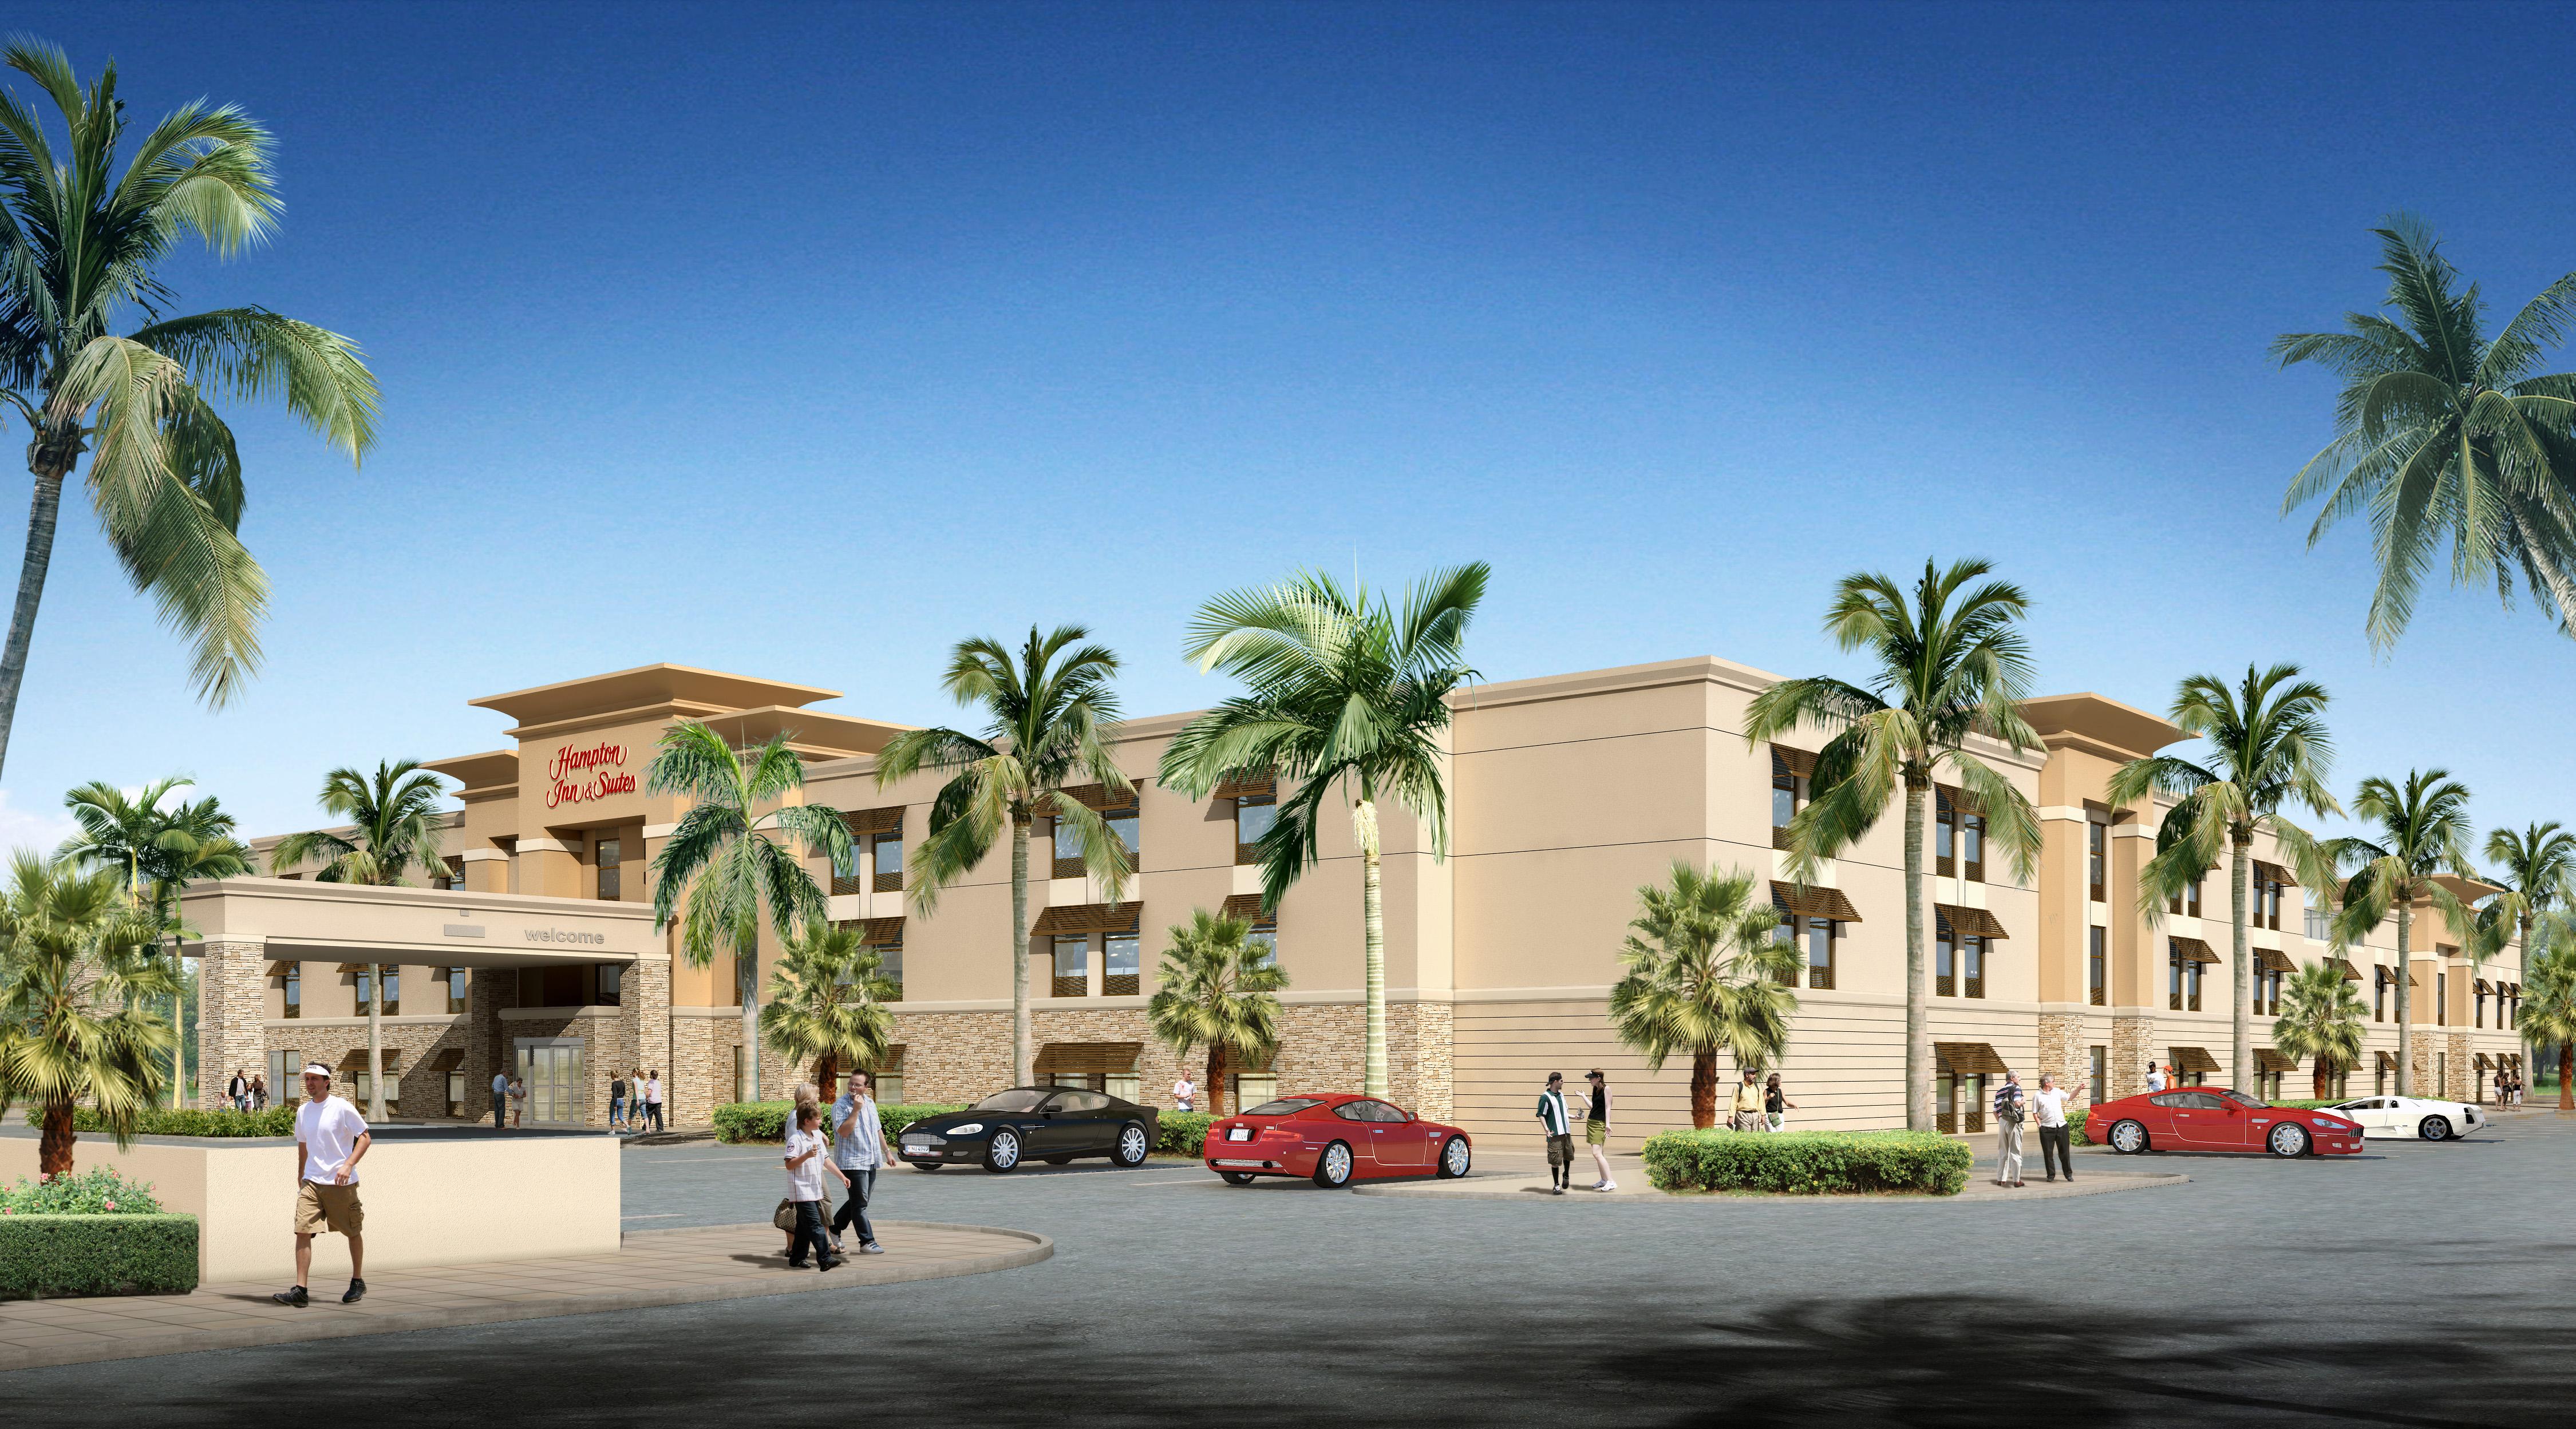 Hampton Inn u0026 Suites Scottsdale Shea